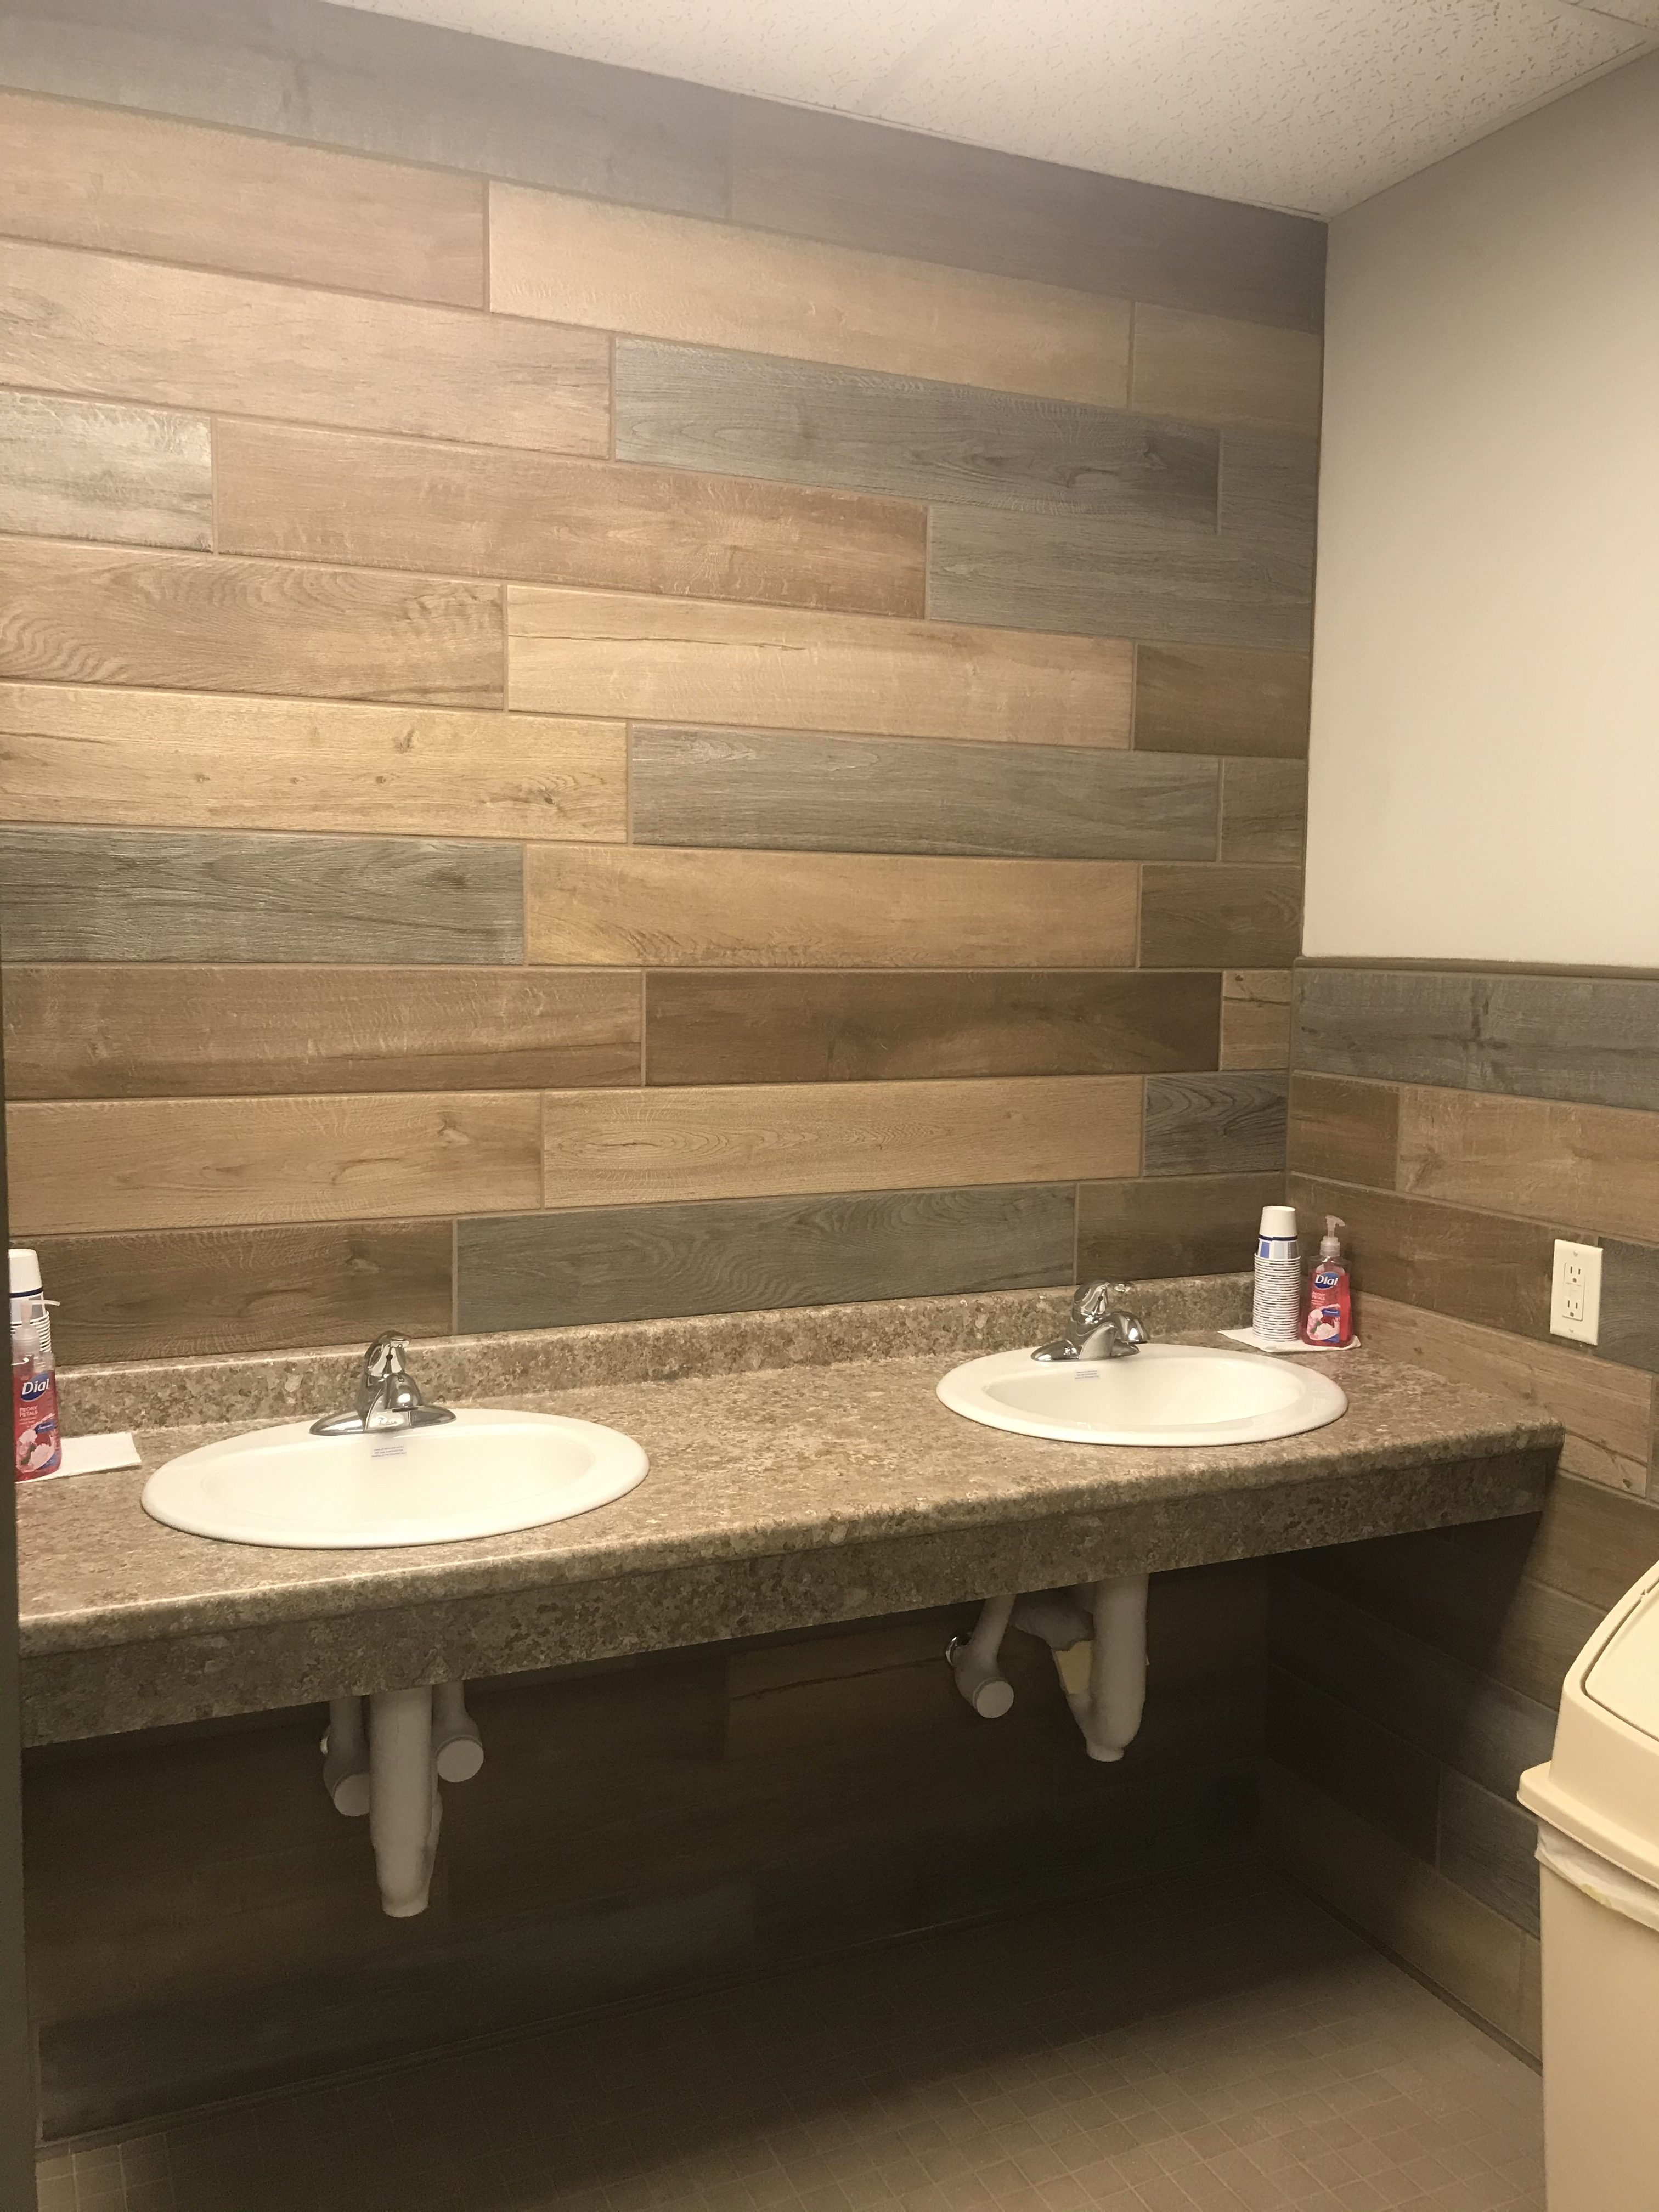 Holton town hall bathrooms 1